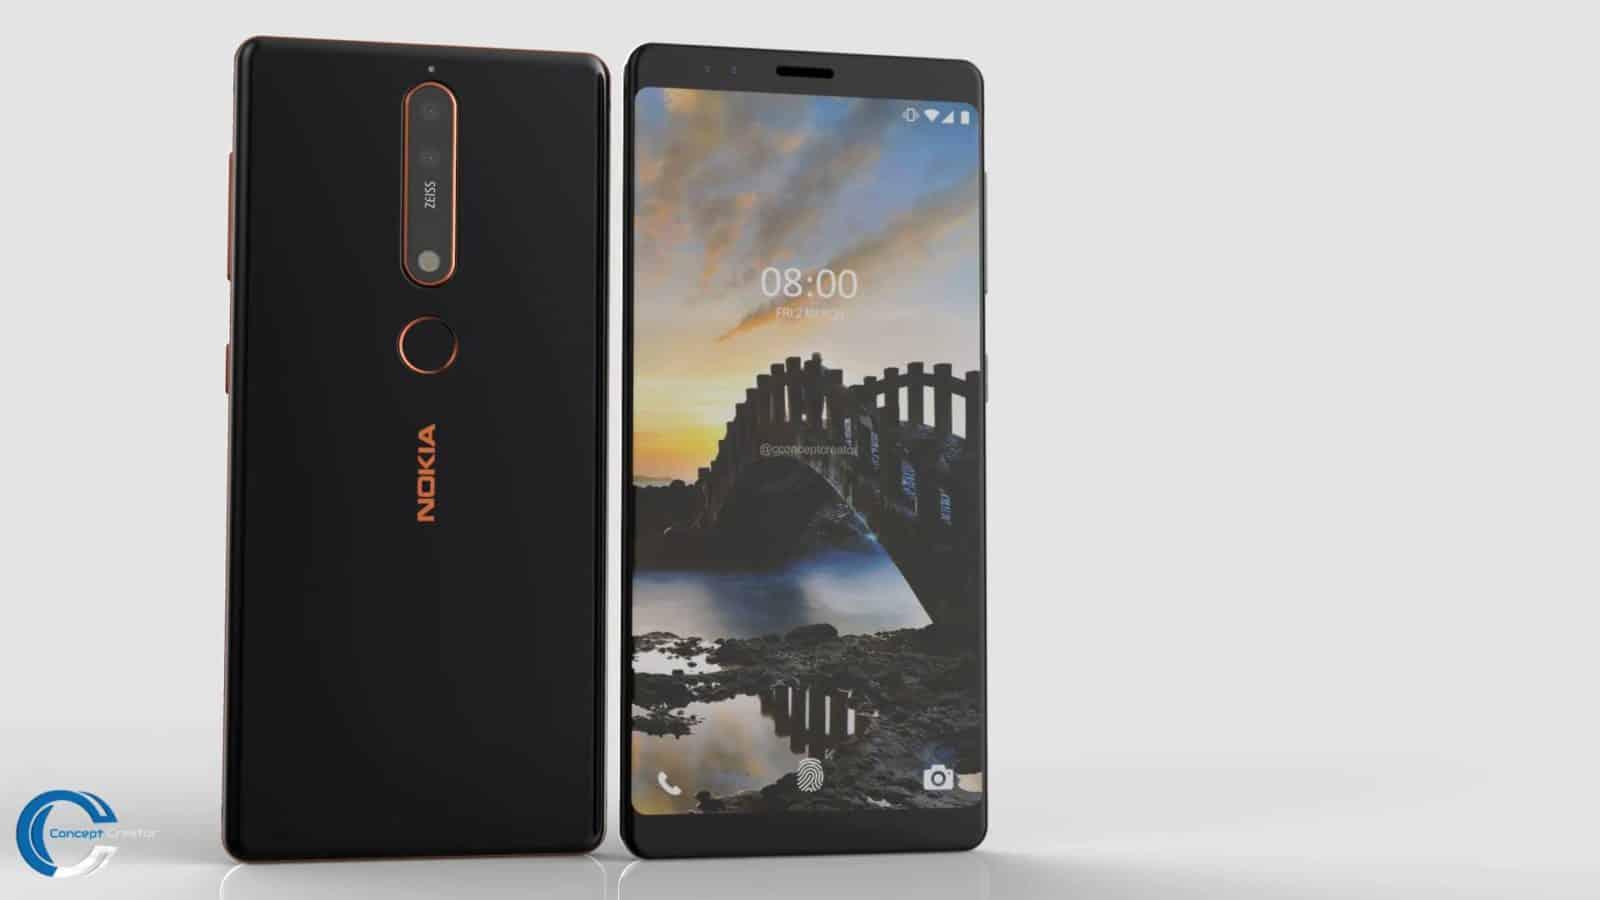 Samsung Note 2 Car Wallpaper Video Nokia 8 Sirocco Concept Comes With Quad Camera